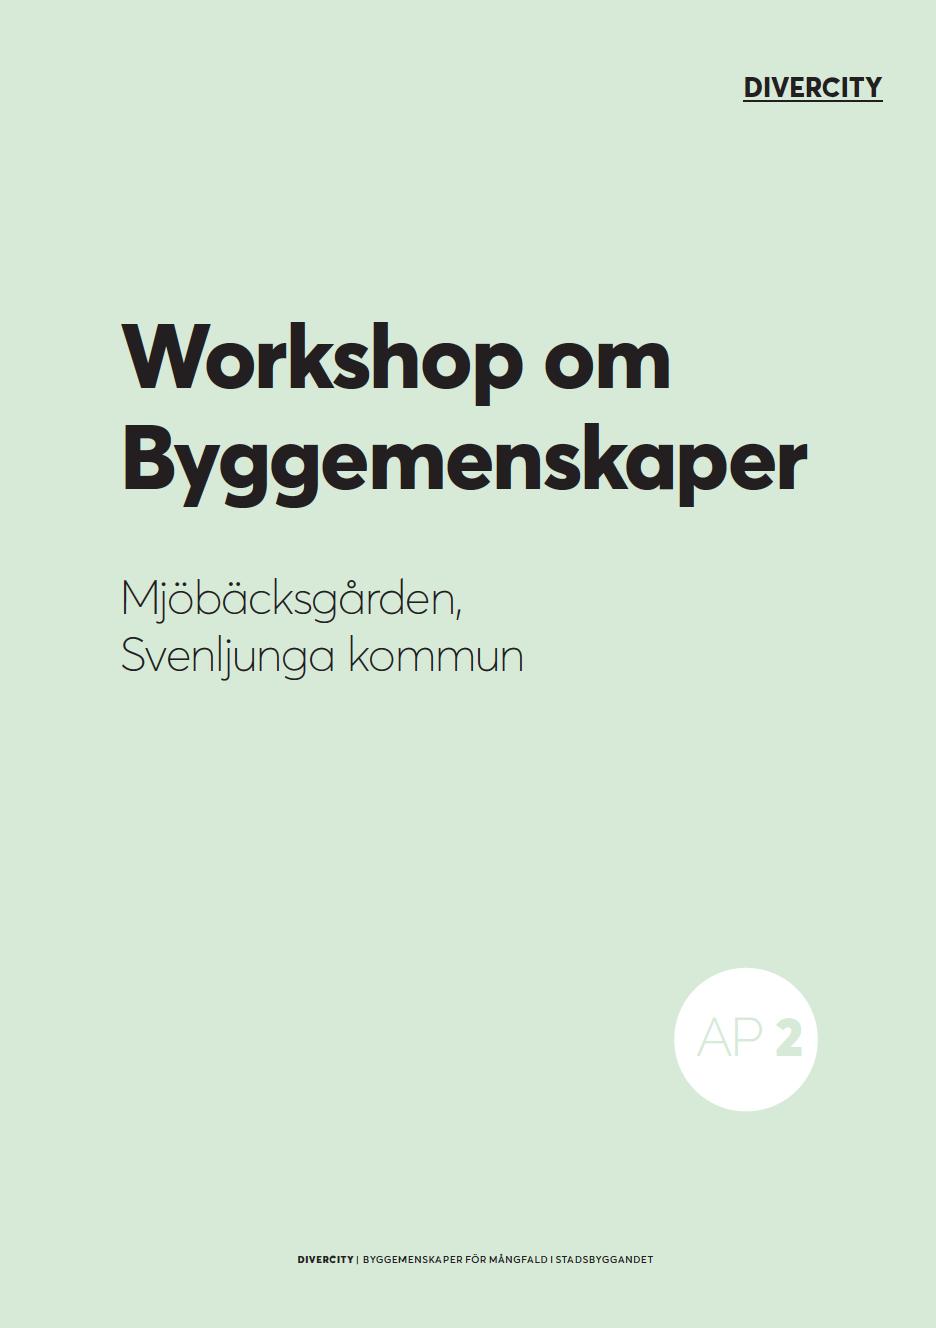 Workshop om byggemenskaper, Svenljunga kommun. 2019